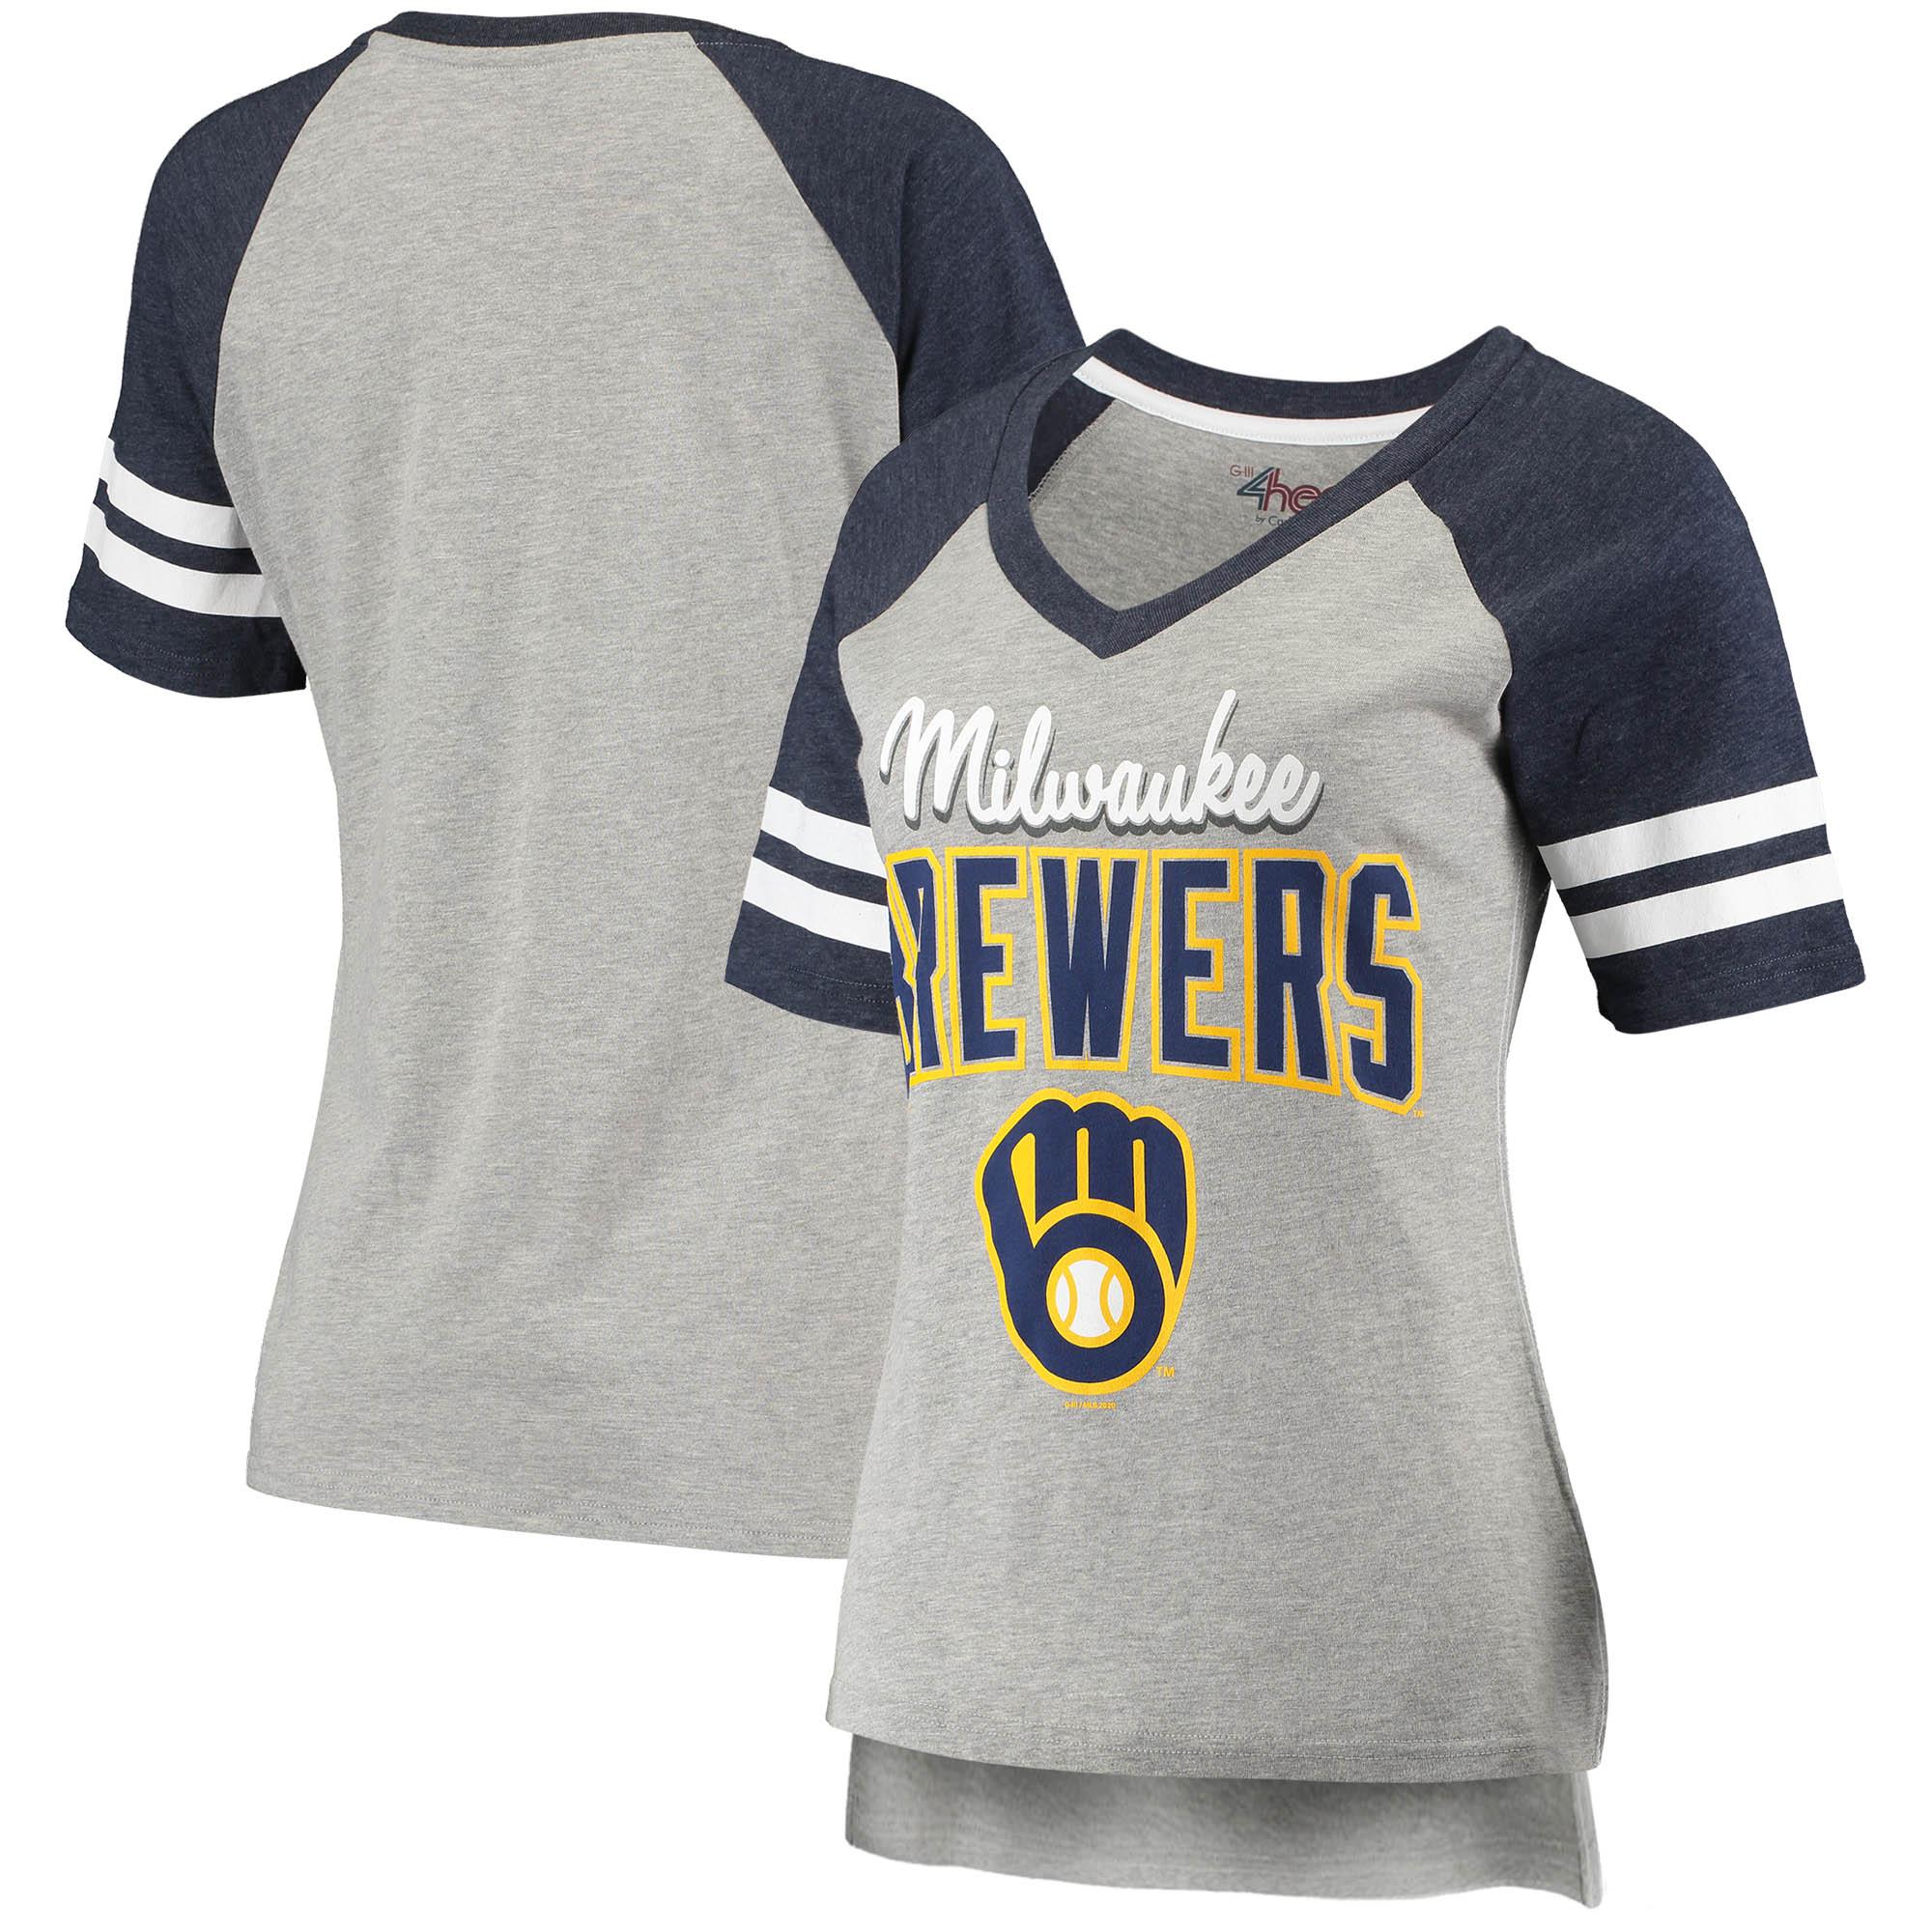 Milwaukee Brewers G-III 4Her by Carl Banks Women's Goal Line Raglan V-Neck T-Shirt - Heathered Gray/Navy